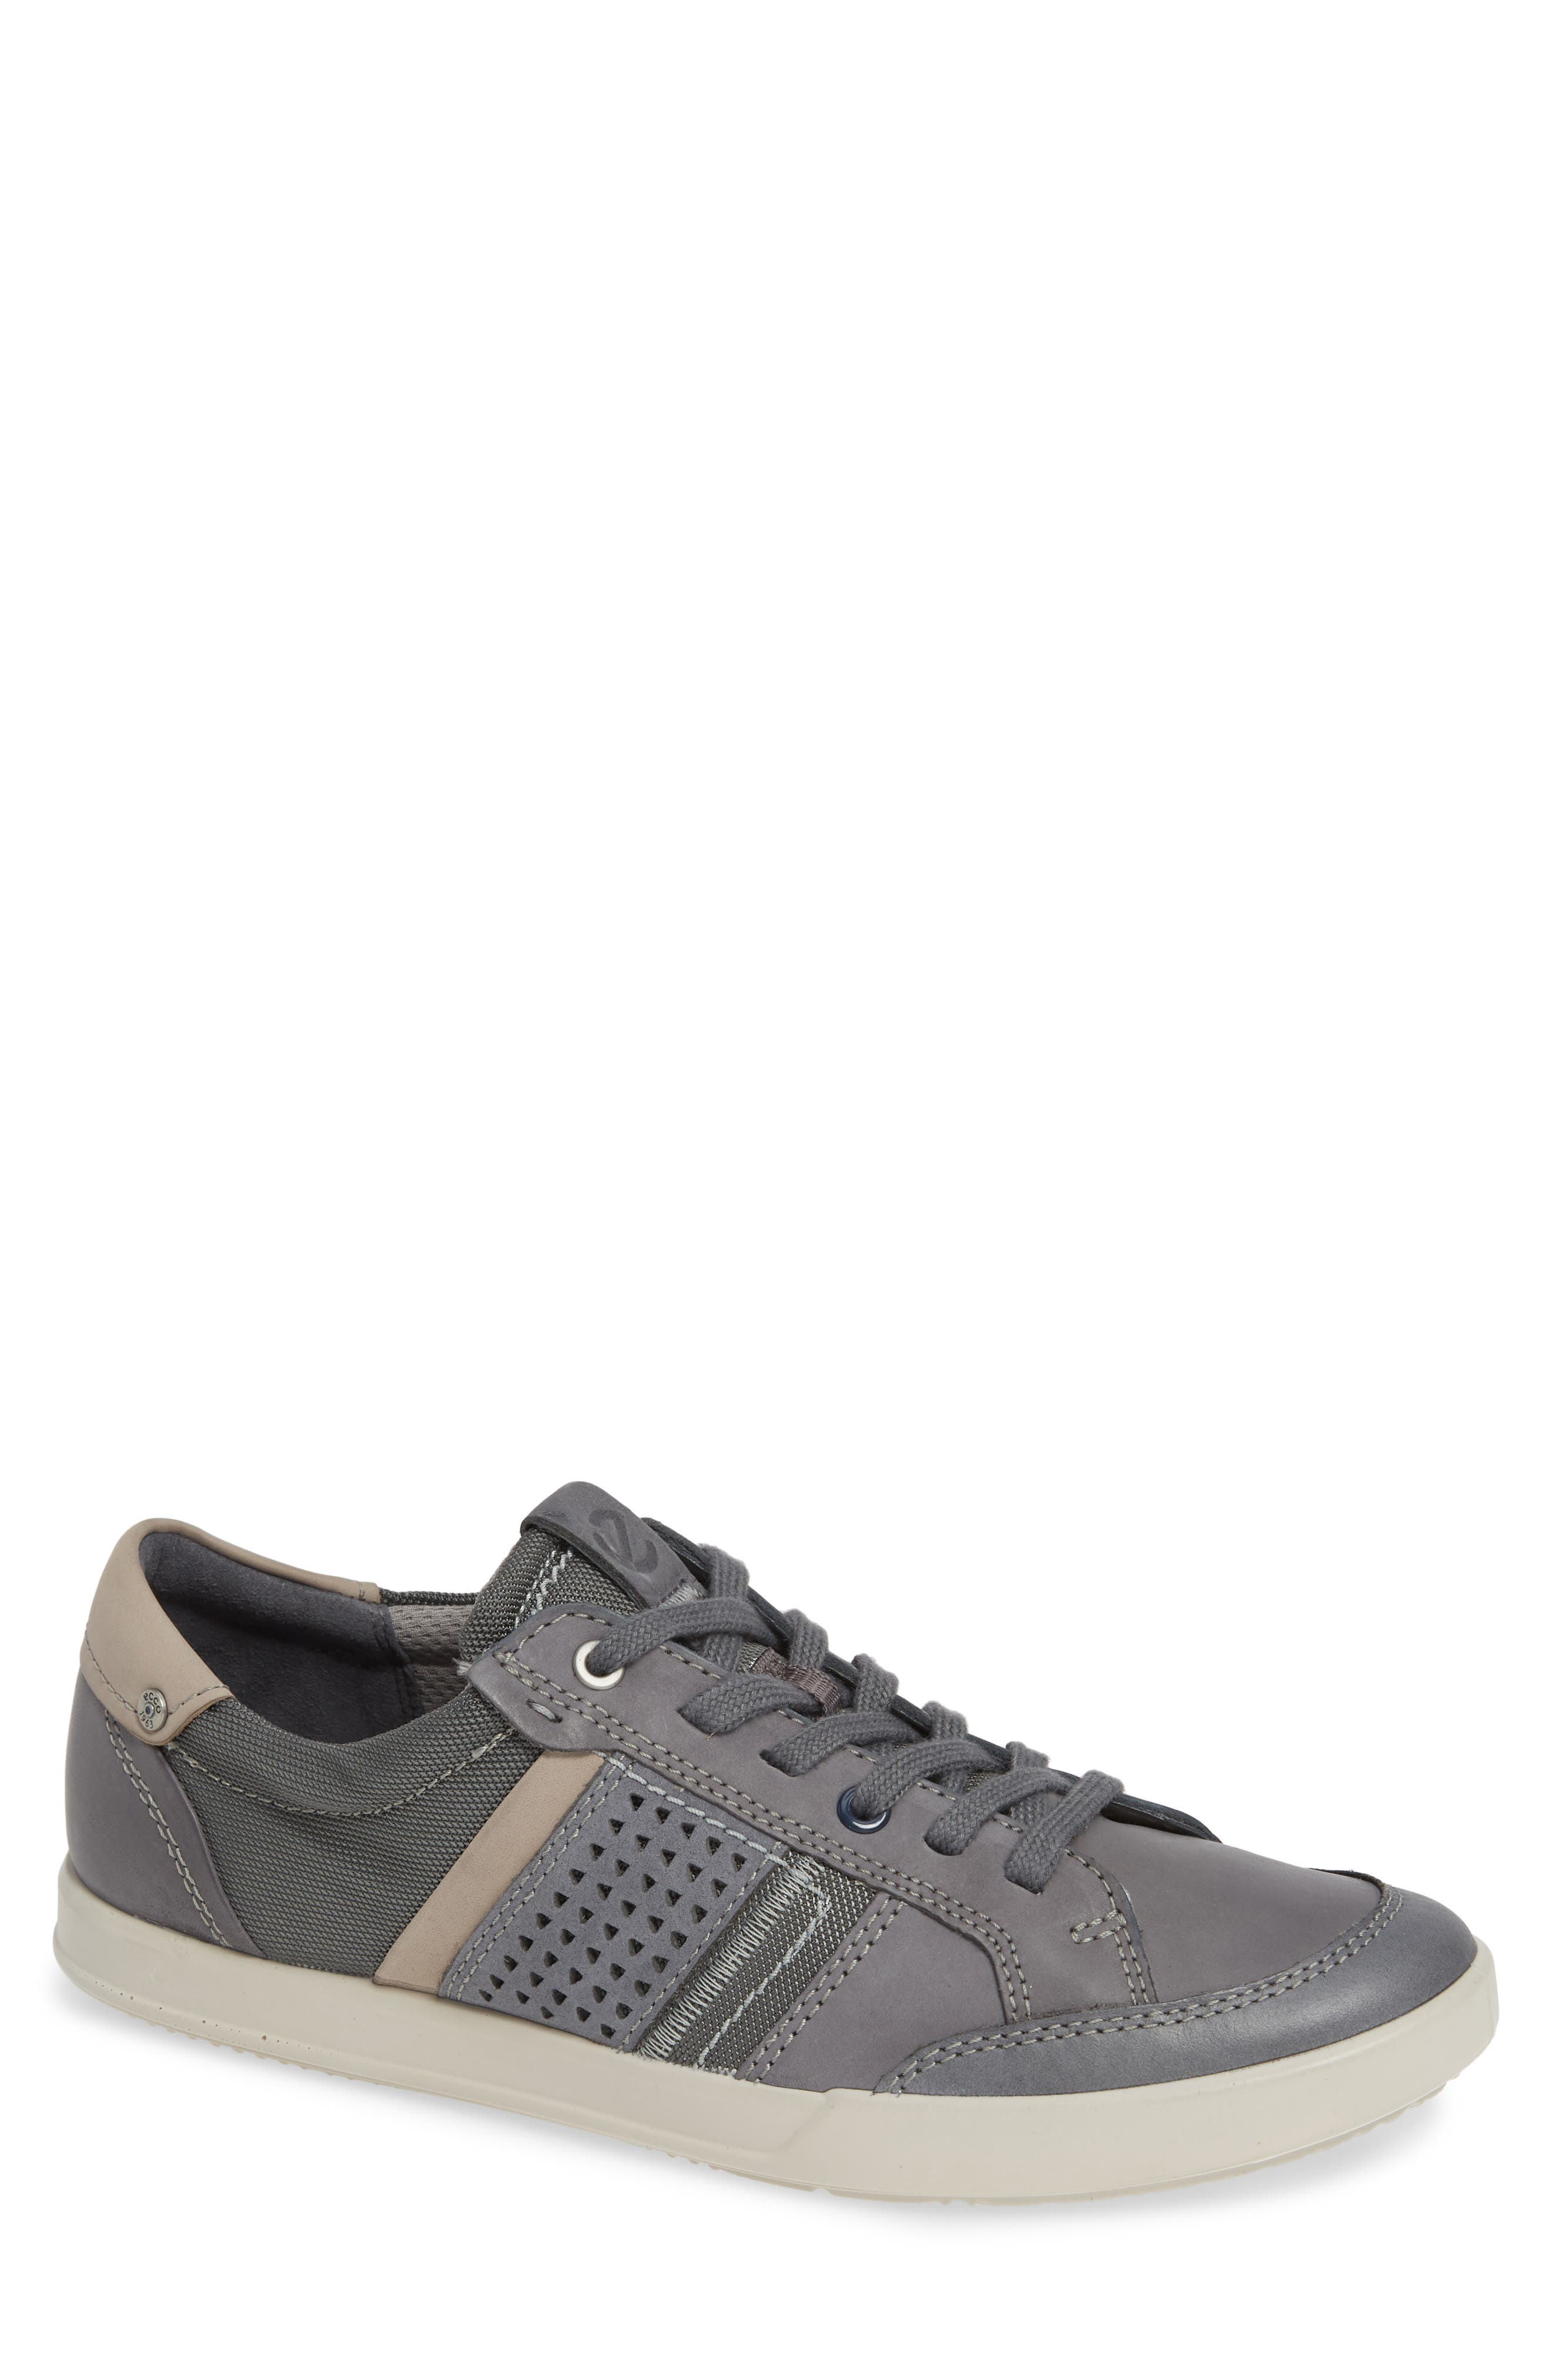 Ecco Collin 2.0 Sneaker - Grey